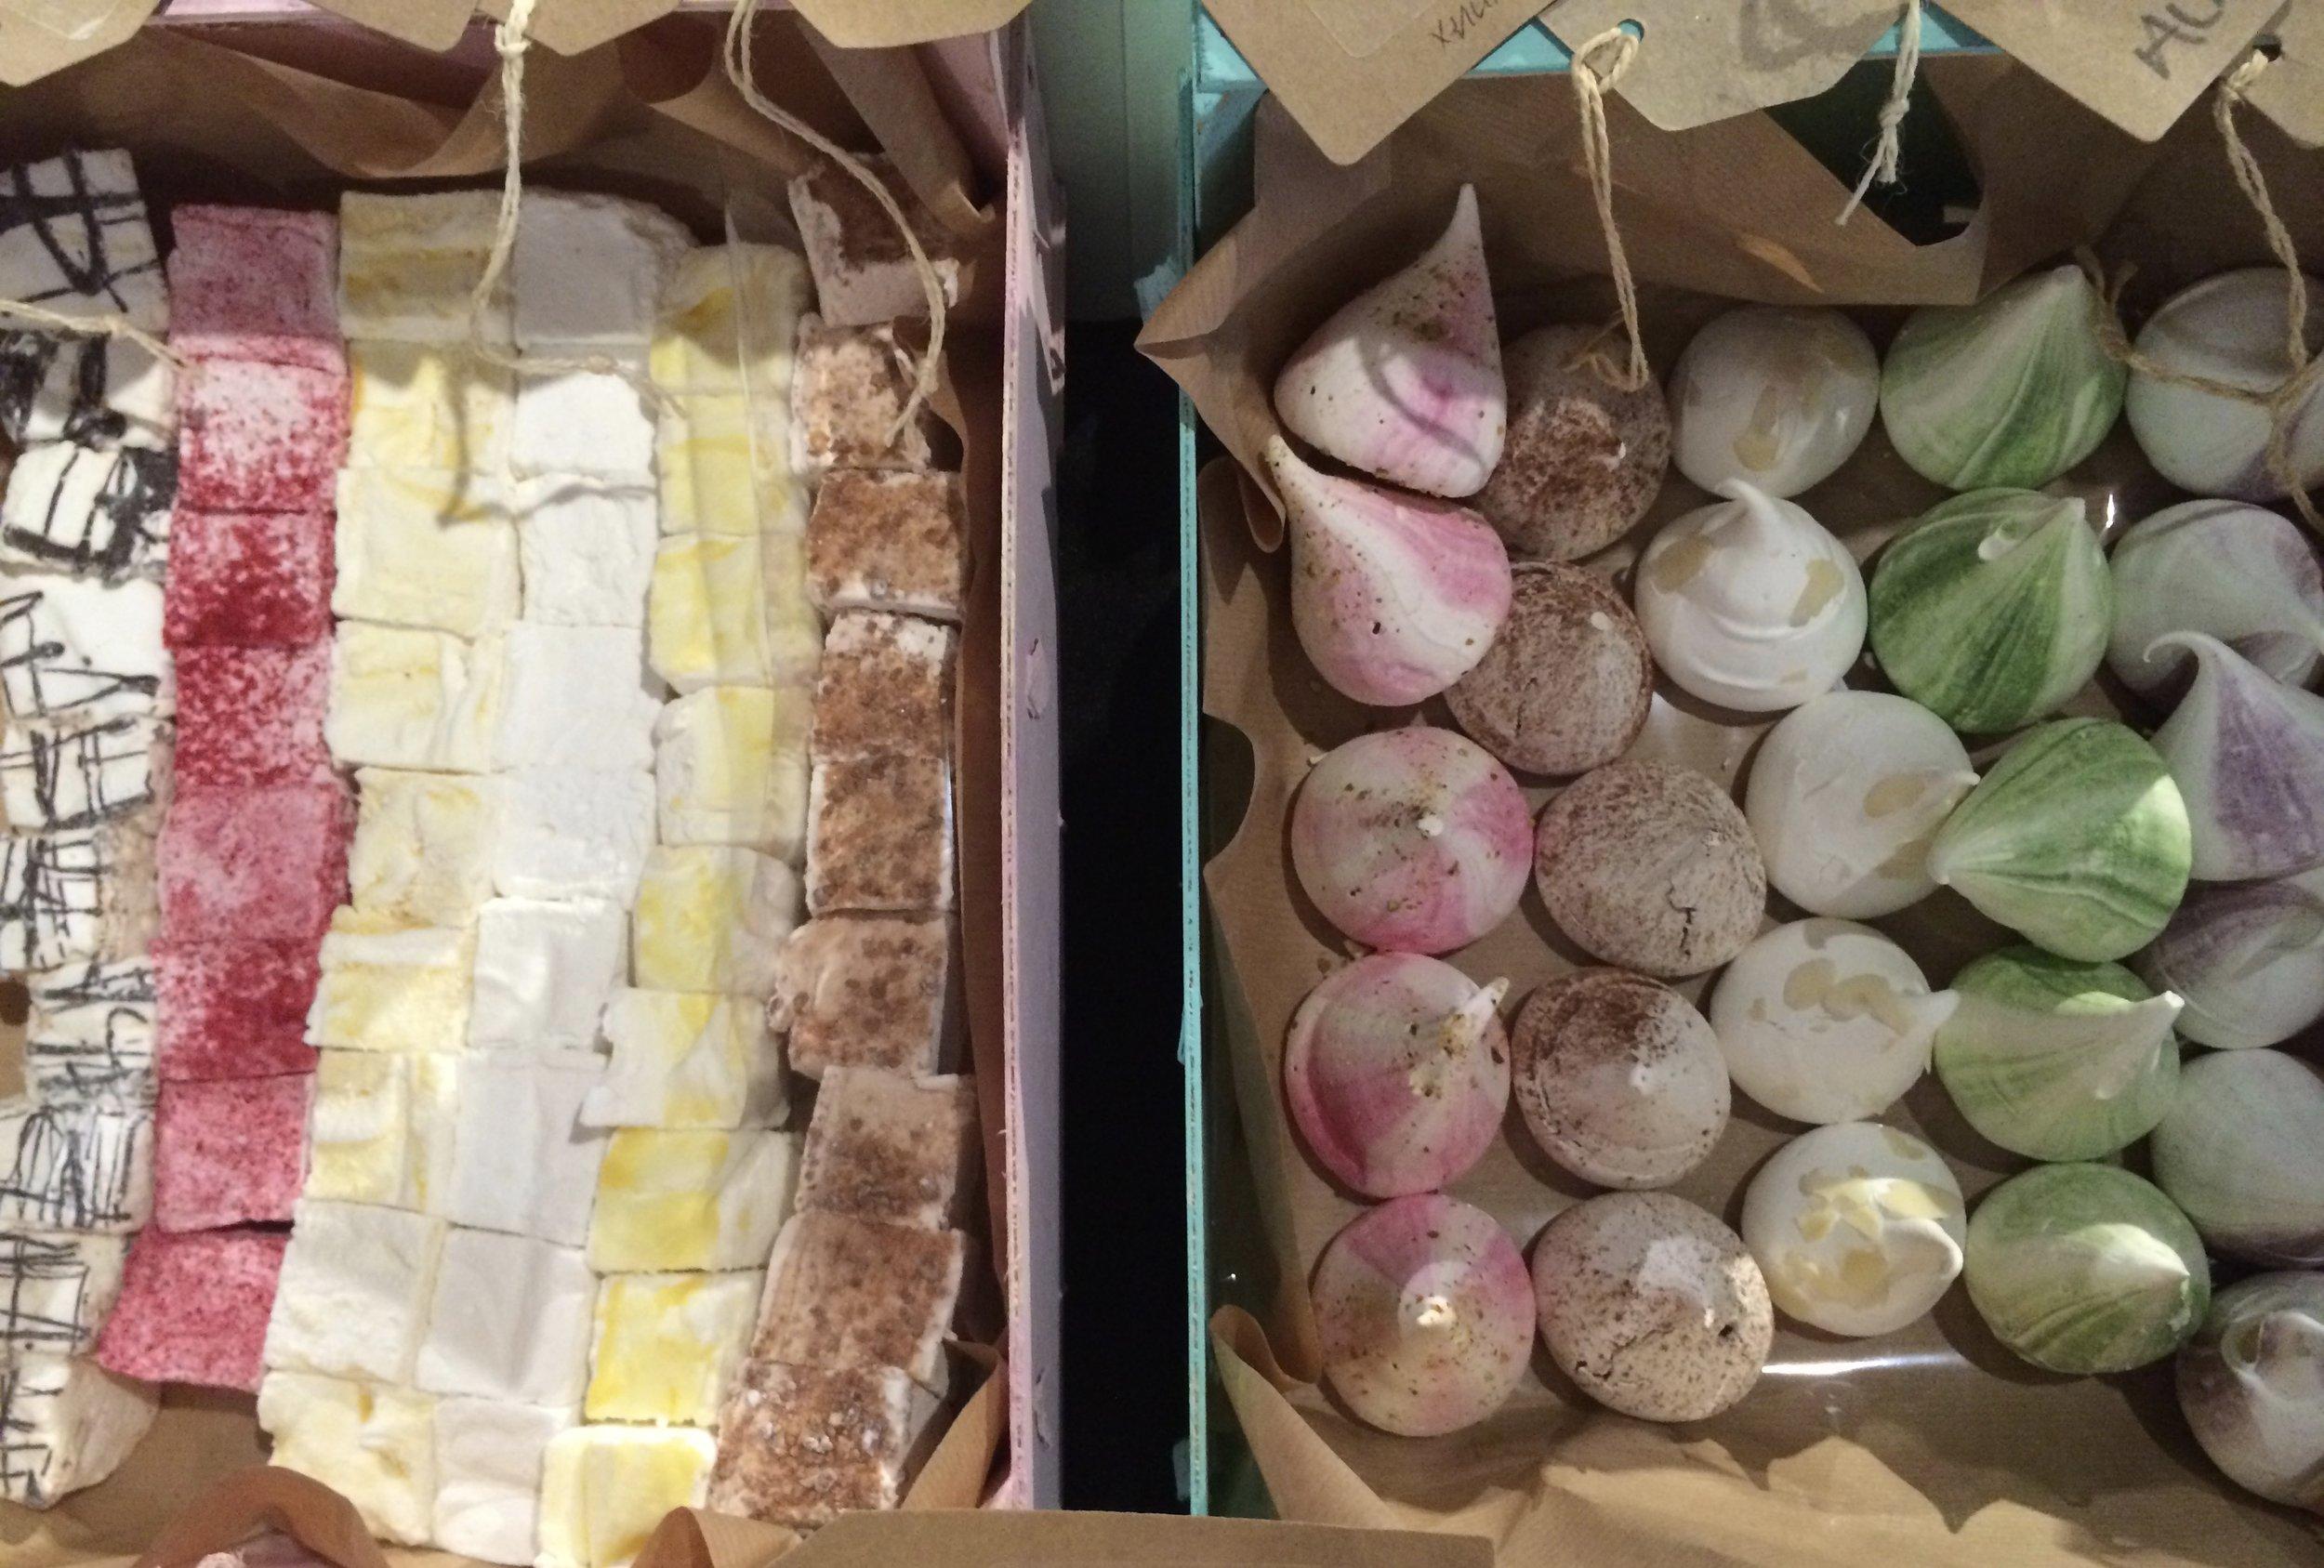 Marshmallows, meringues, Dublin food, Dublin treats, corporate gifts